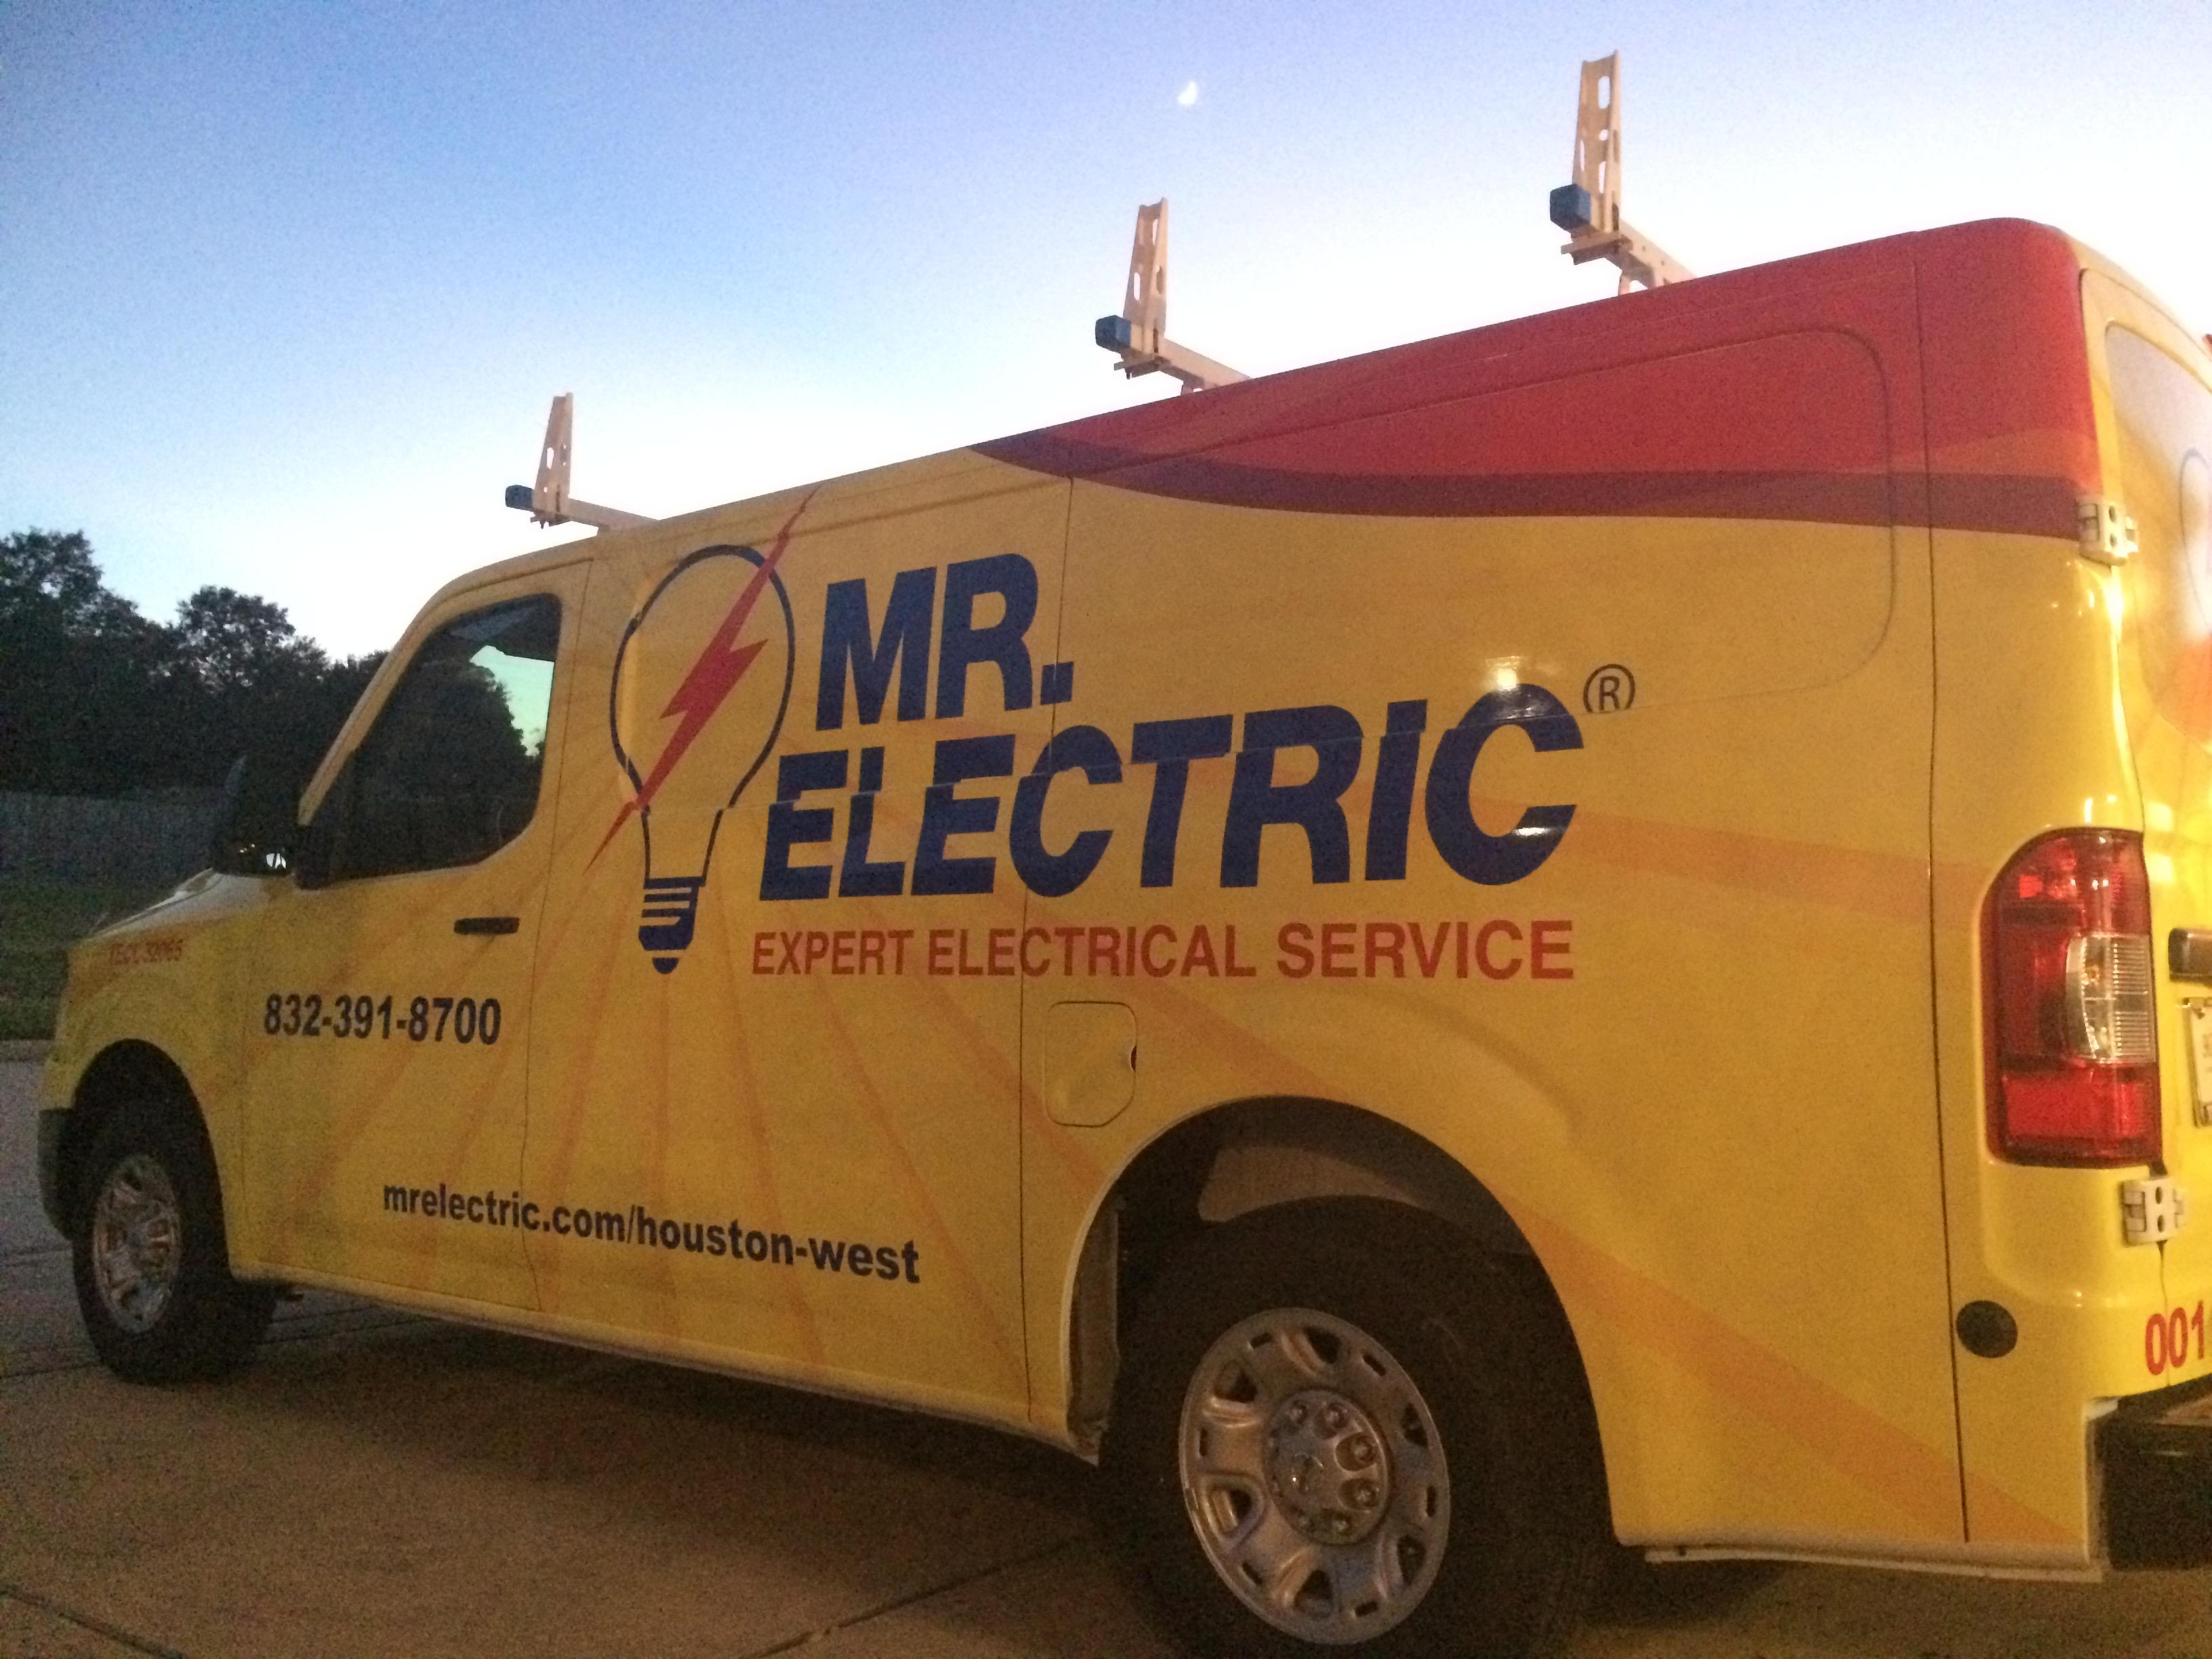 Mr. Electric image 35